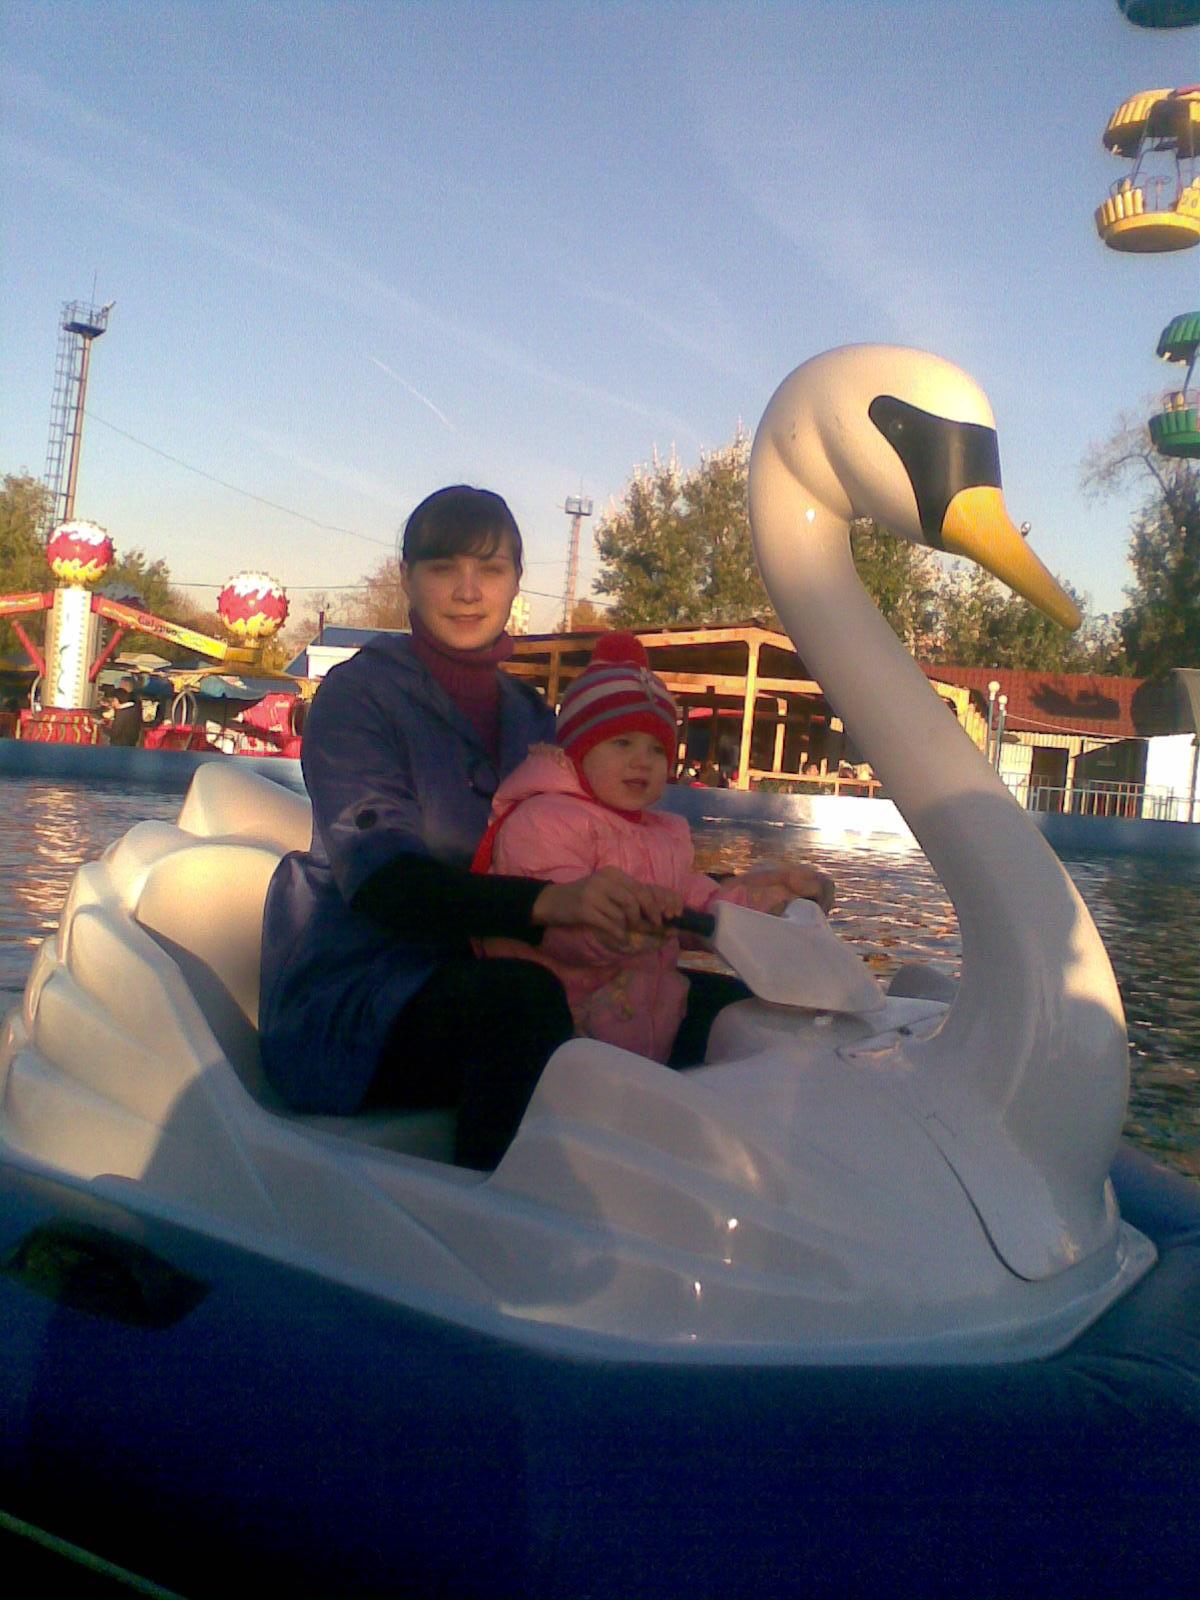 Гуси-лебеди)). С мамой на прогулке